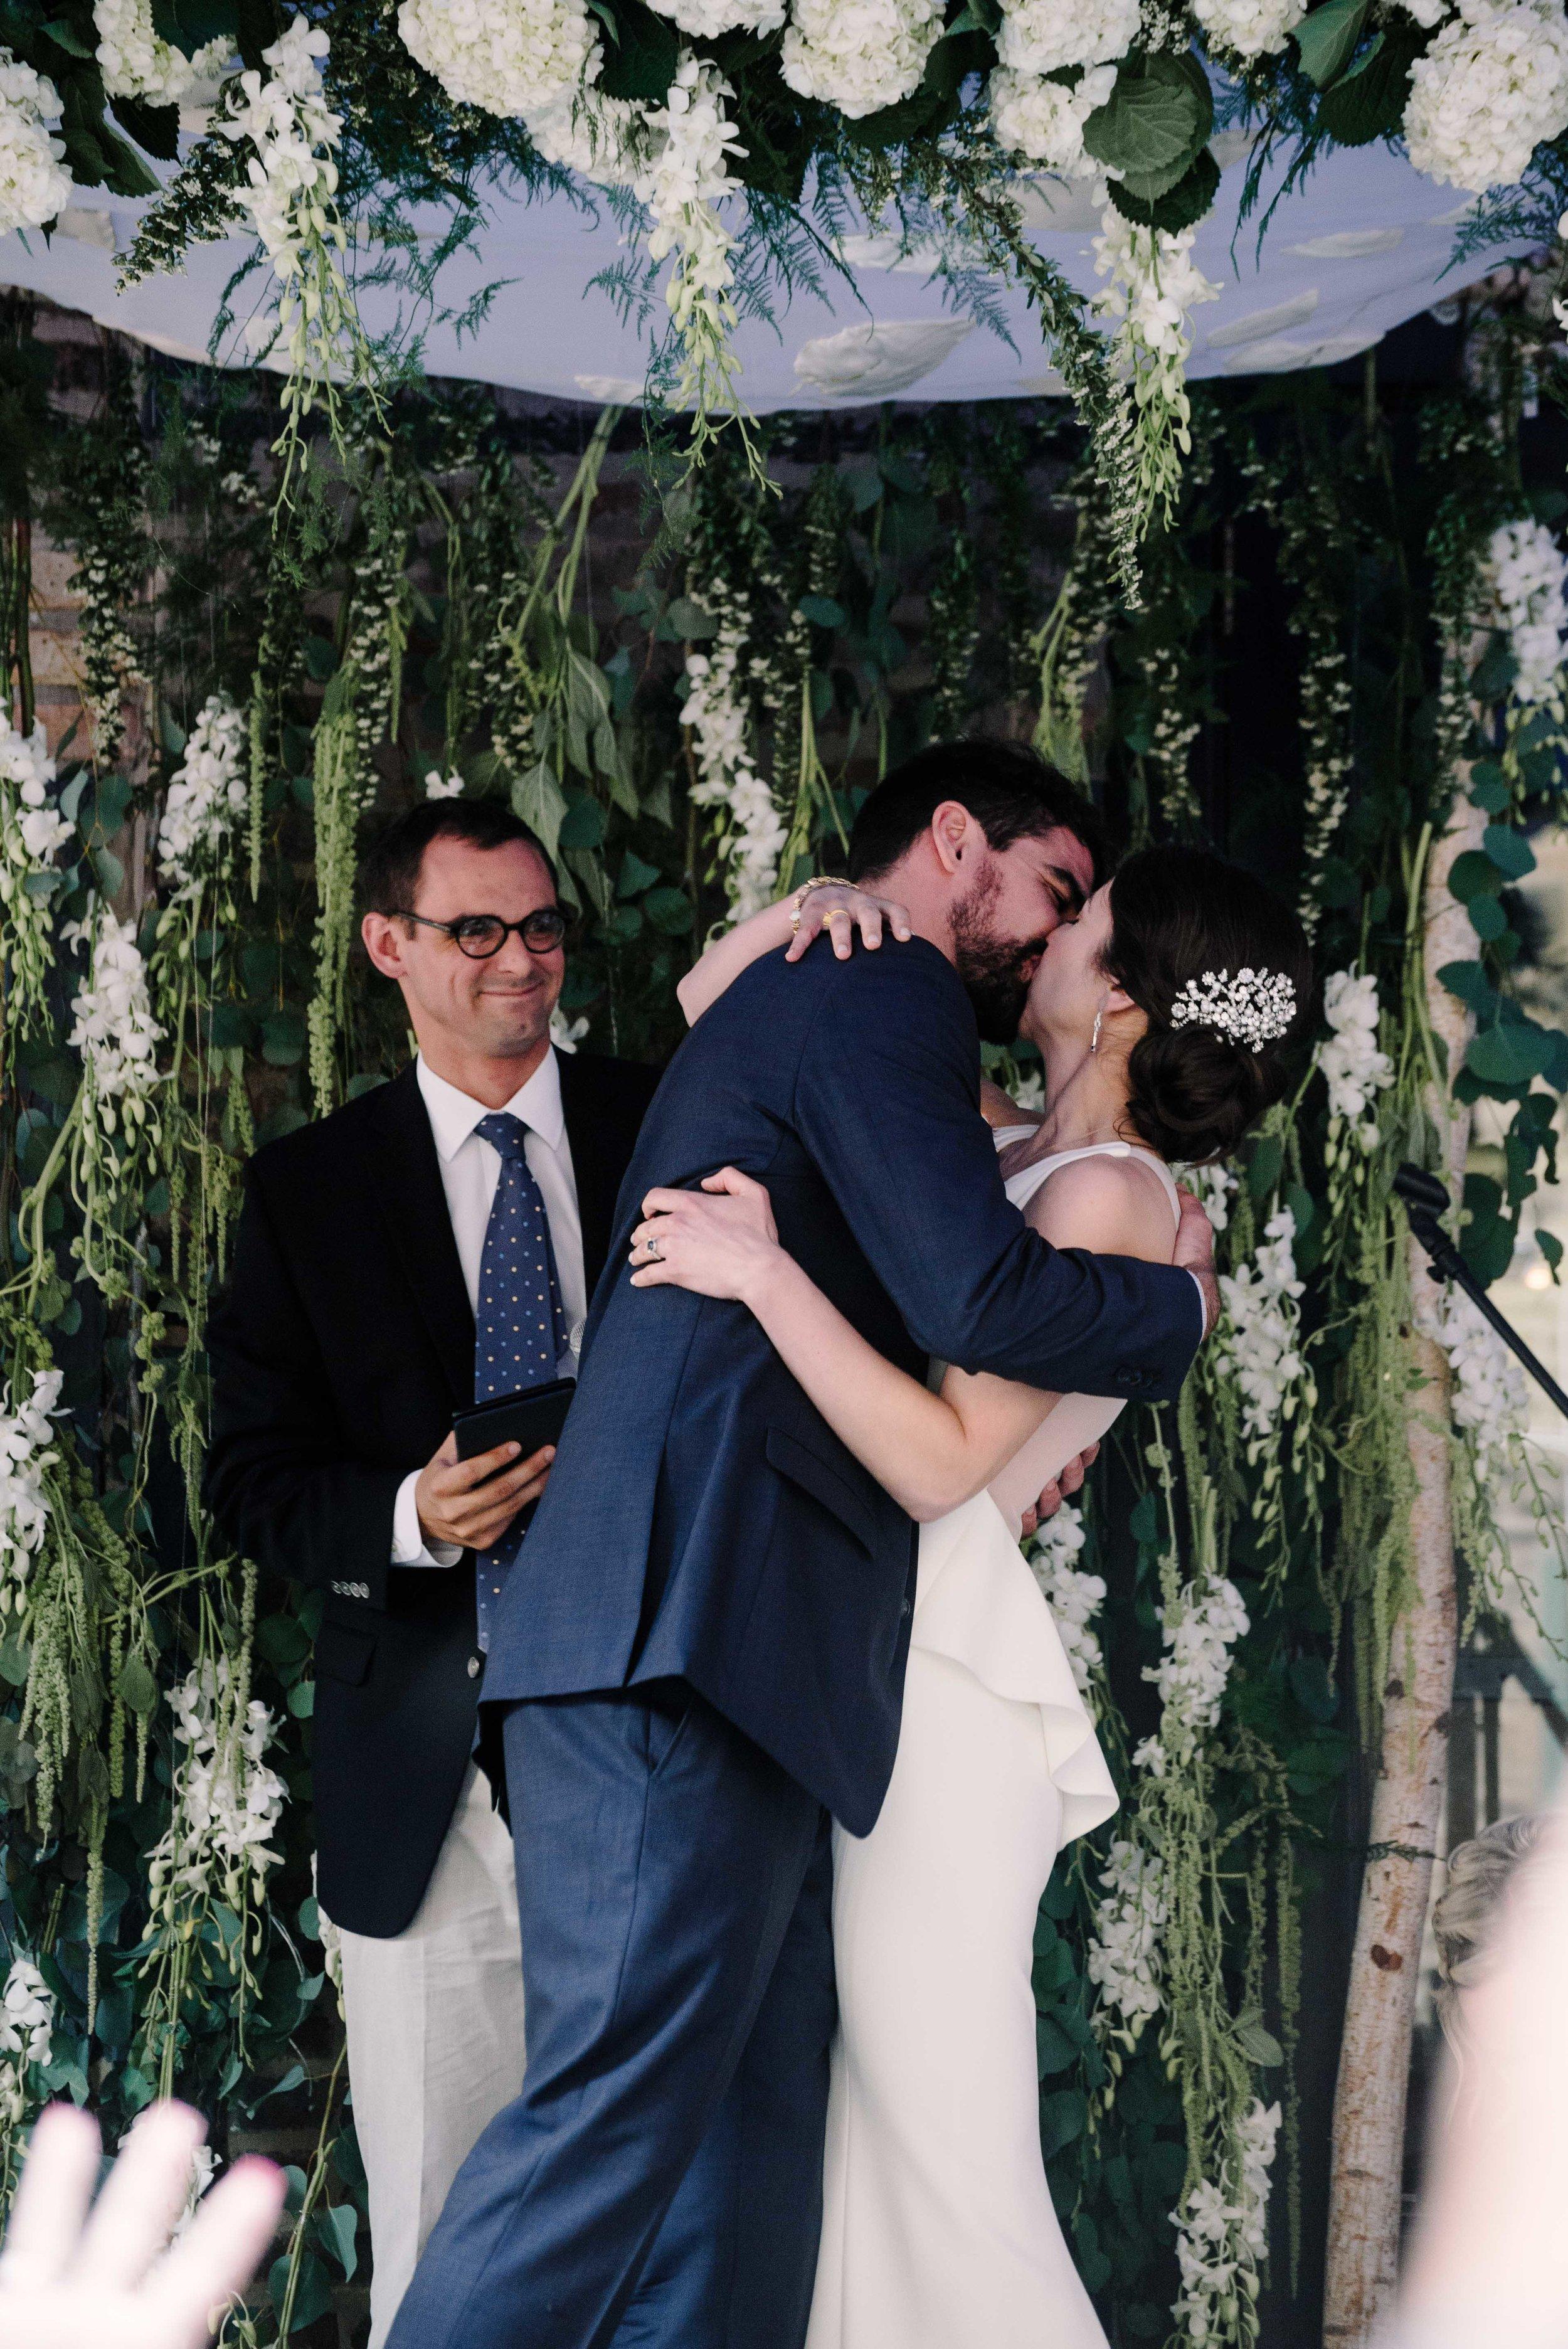 Patricia-Steve-Blog-Indianapolis-Wedding-67.jpg